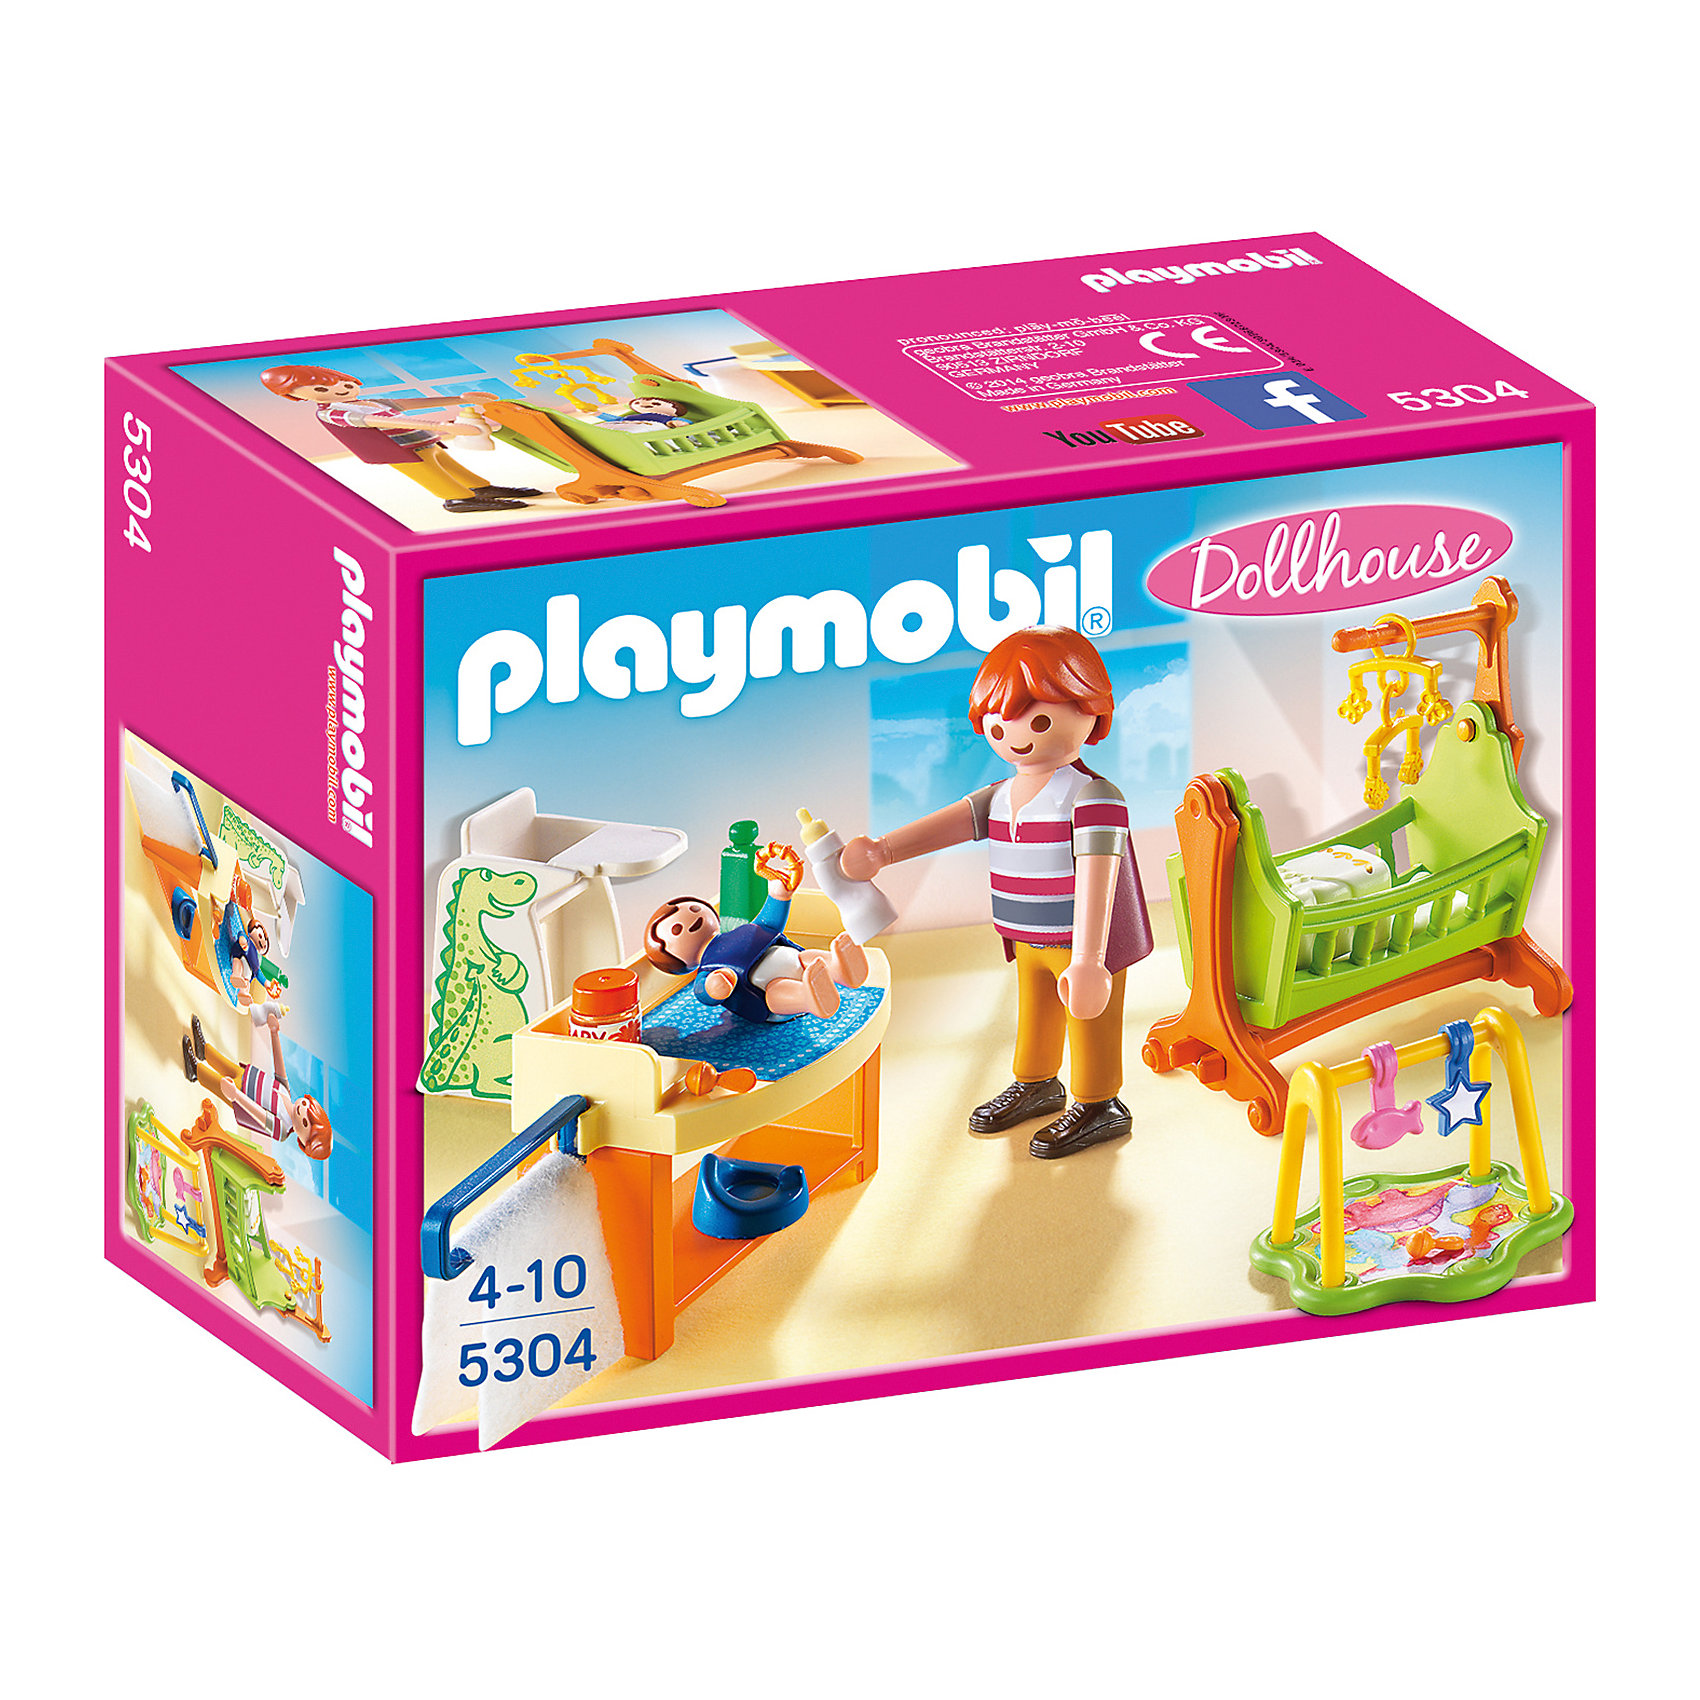 PLAYMOBIL® Детская комната с люлькой, PLAYMOBIL фигурки игрушки playmobil зоопарк стая фламинго